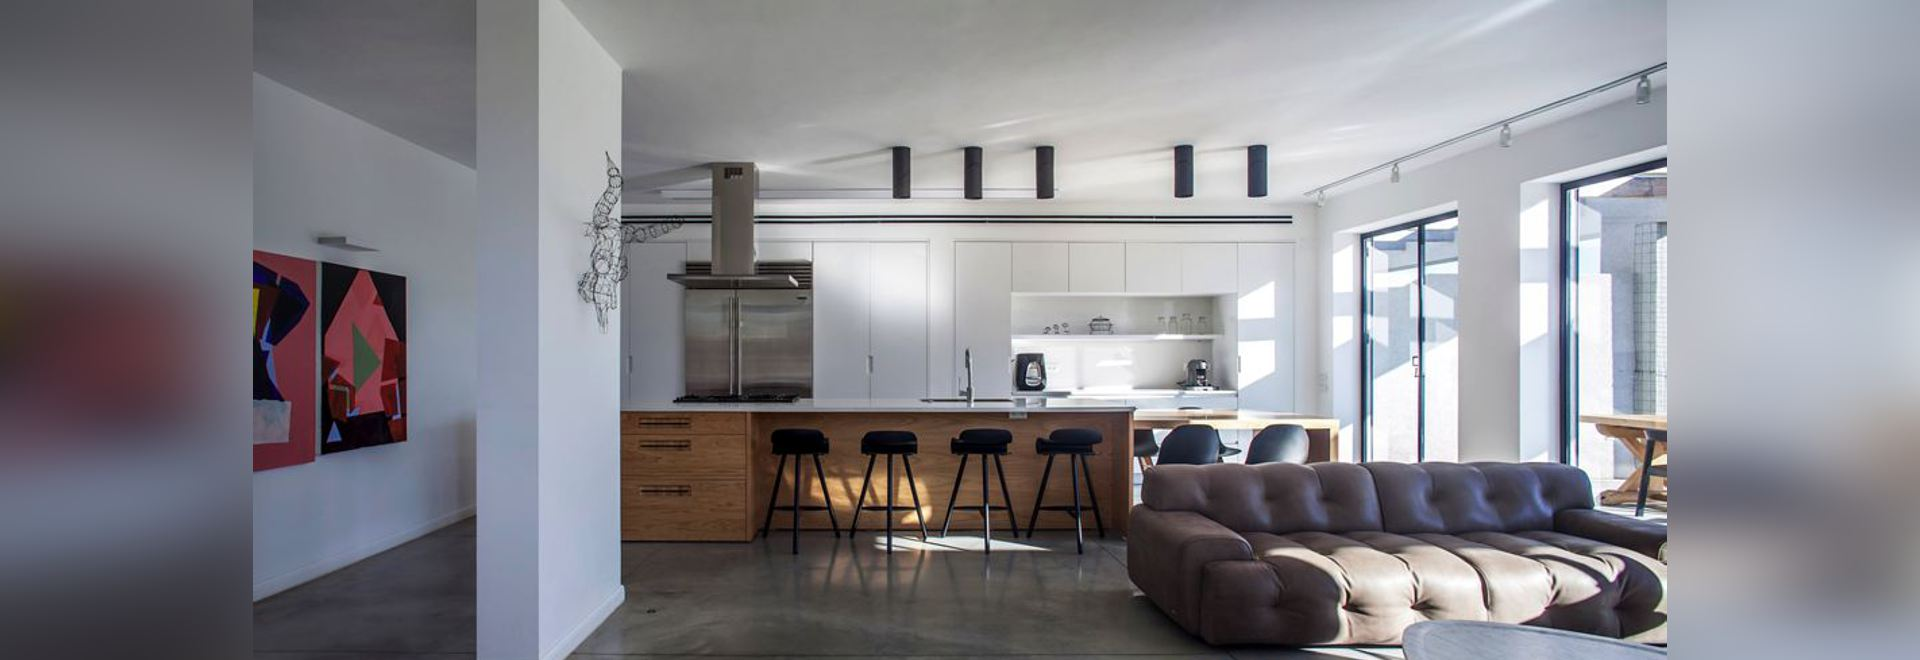 "Ein modernes ""Kibbuz-"" Haus - Lohamei HaGeta\'ot, Israel"